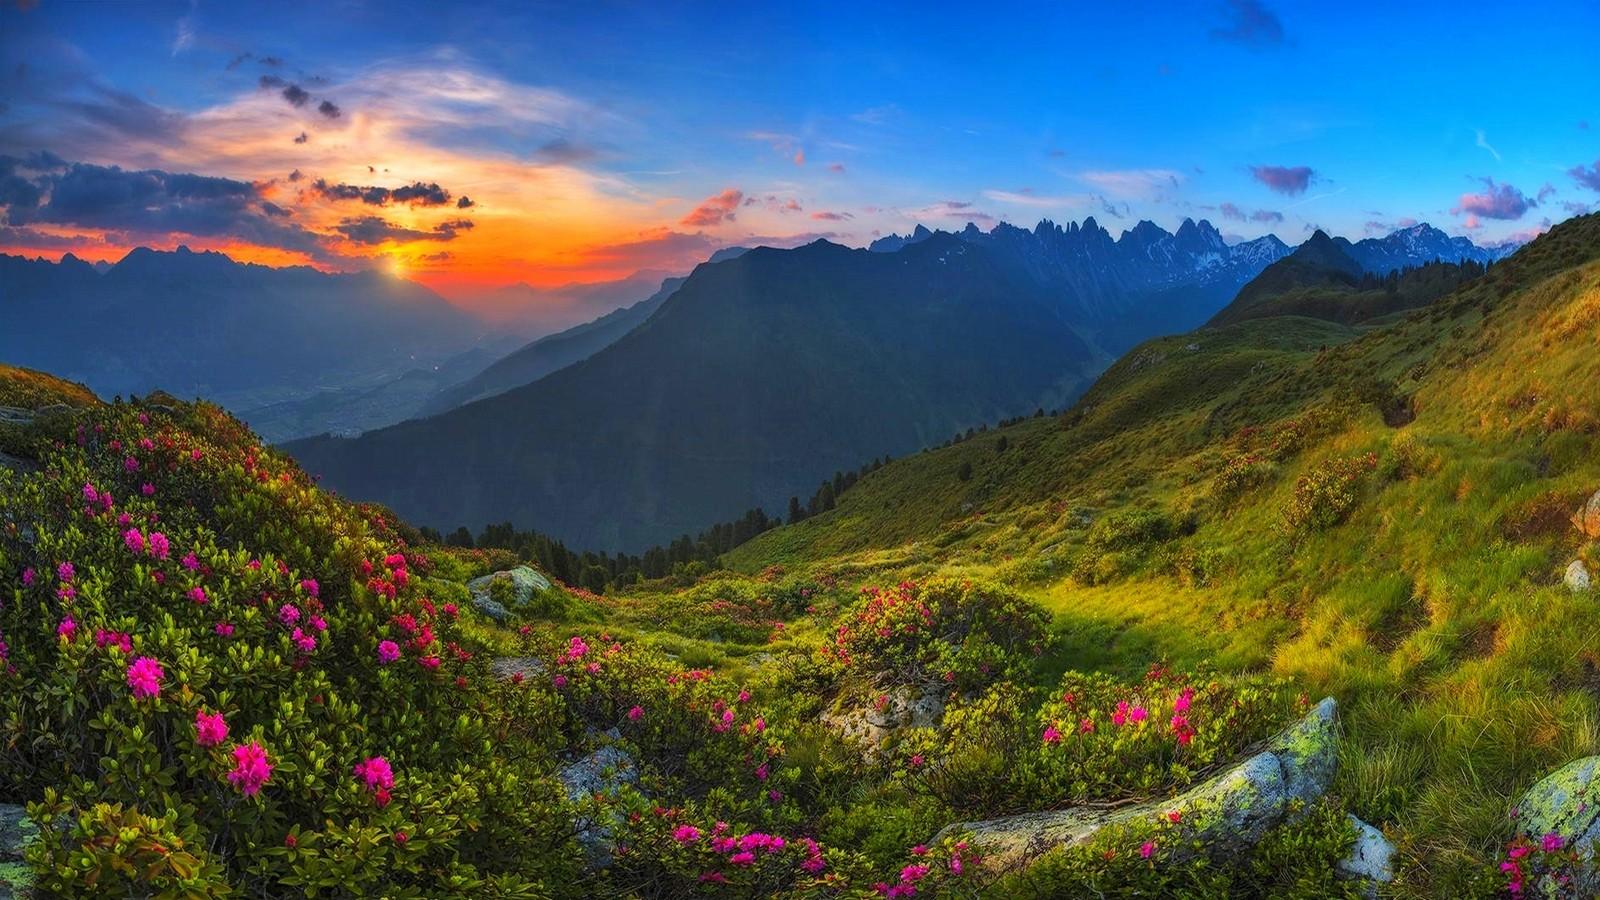 landscape mountains hill nature grass sky clouds mist valley wildflowers wilderness Austria Tyrol plateau ridge autumn